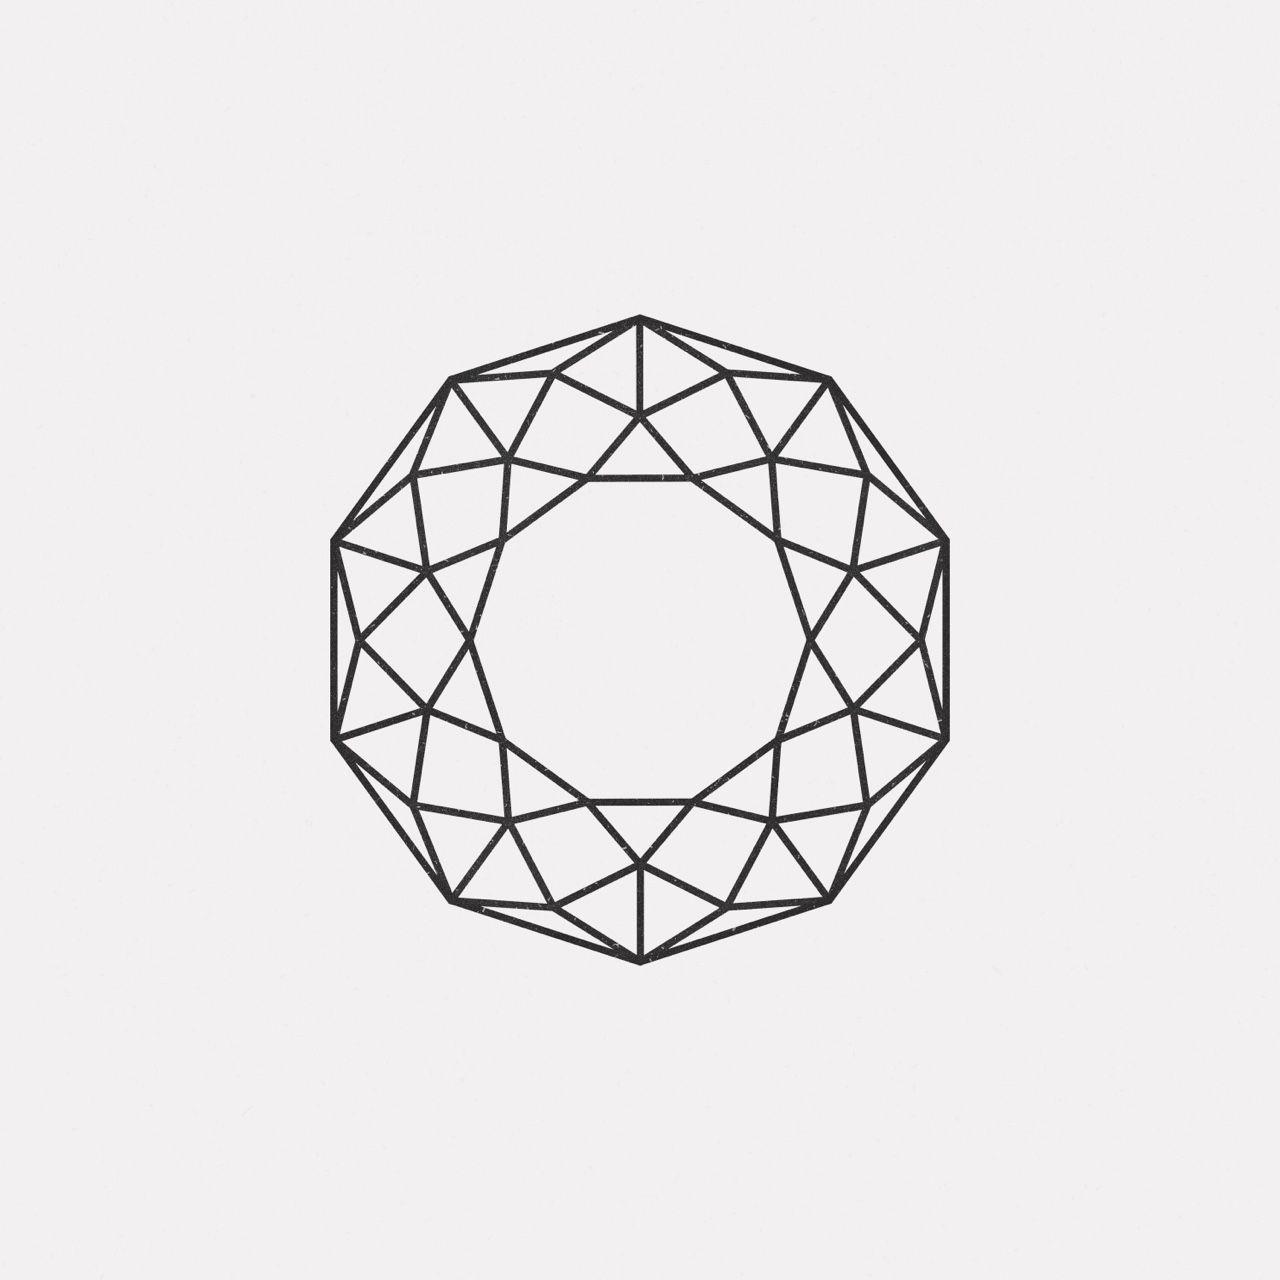 Geometric Shape This Uses Many Geometric Shapes To Create